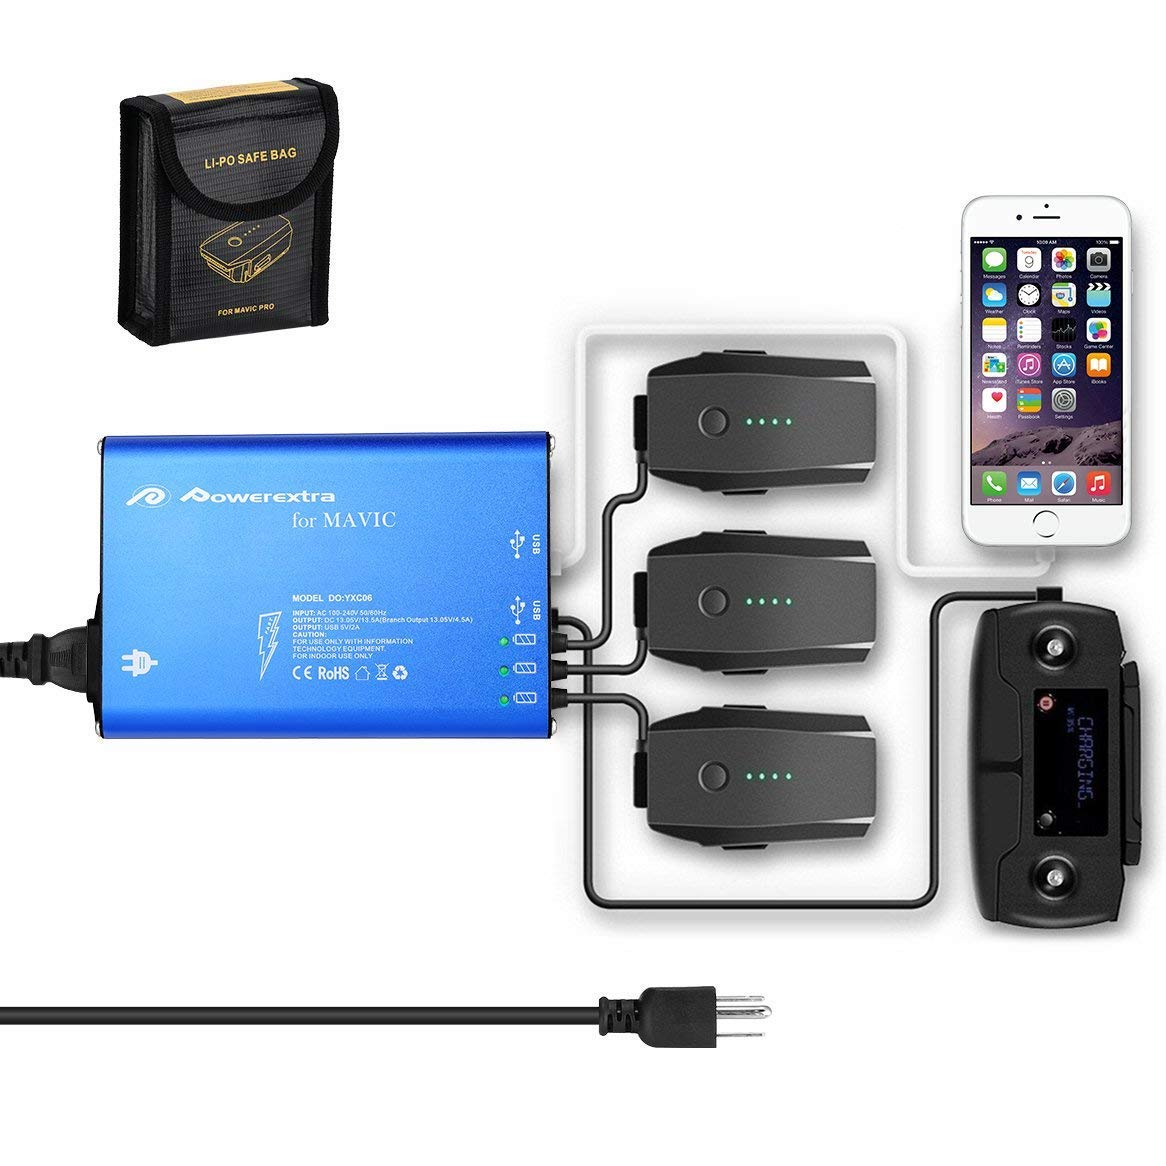 Powerextra Mavic Pro & Platinum & Alpine White 176W 5 in 1 Rapid Intelligent Multi Battery Charger Hub (Charge 3 Batteries & 2 USB Ports) + Mavic Pro Battery Safe Bag (Not Fit for Mavic 2)